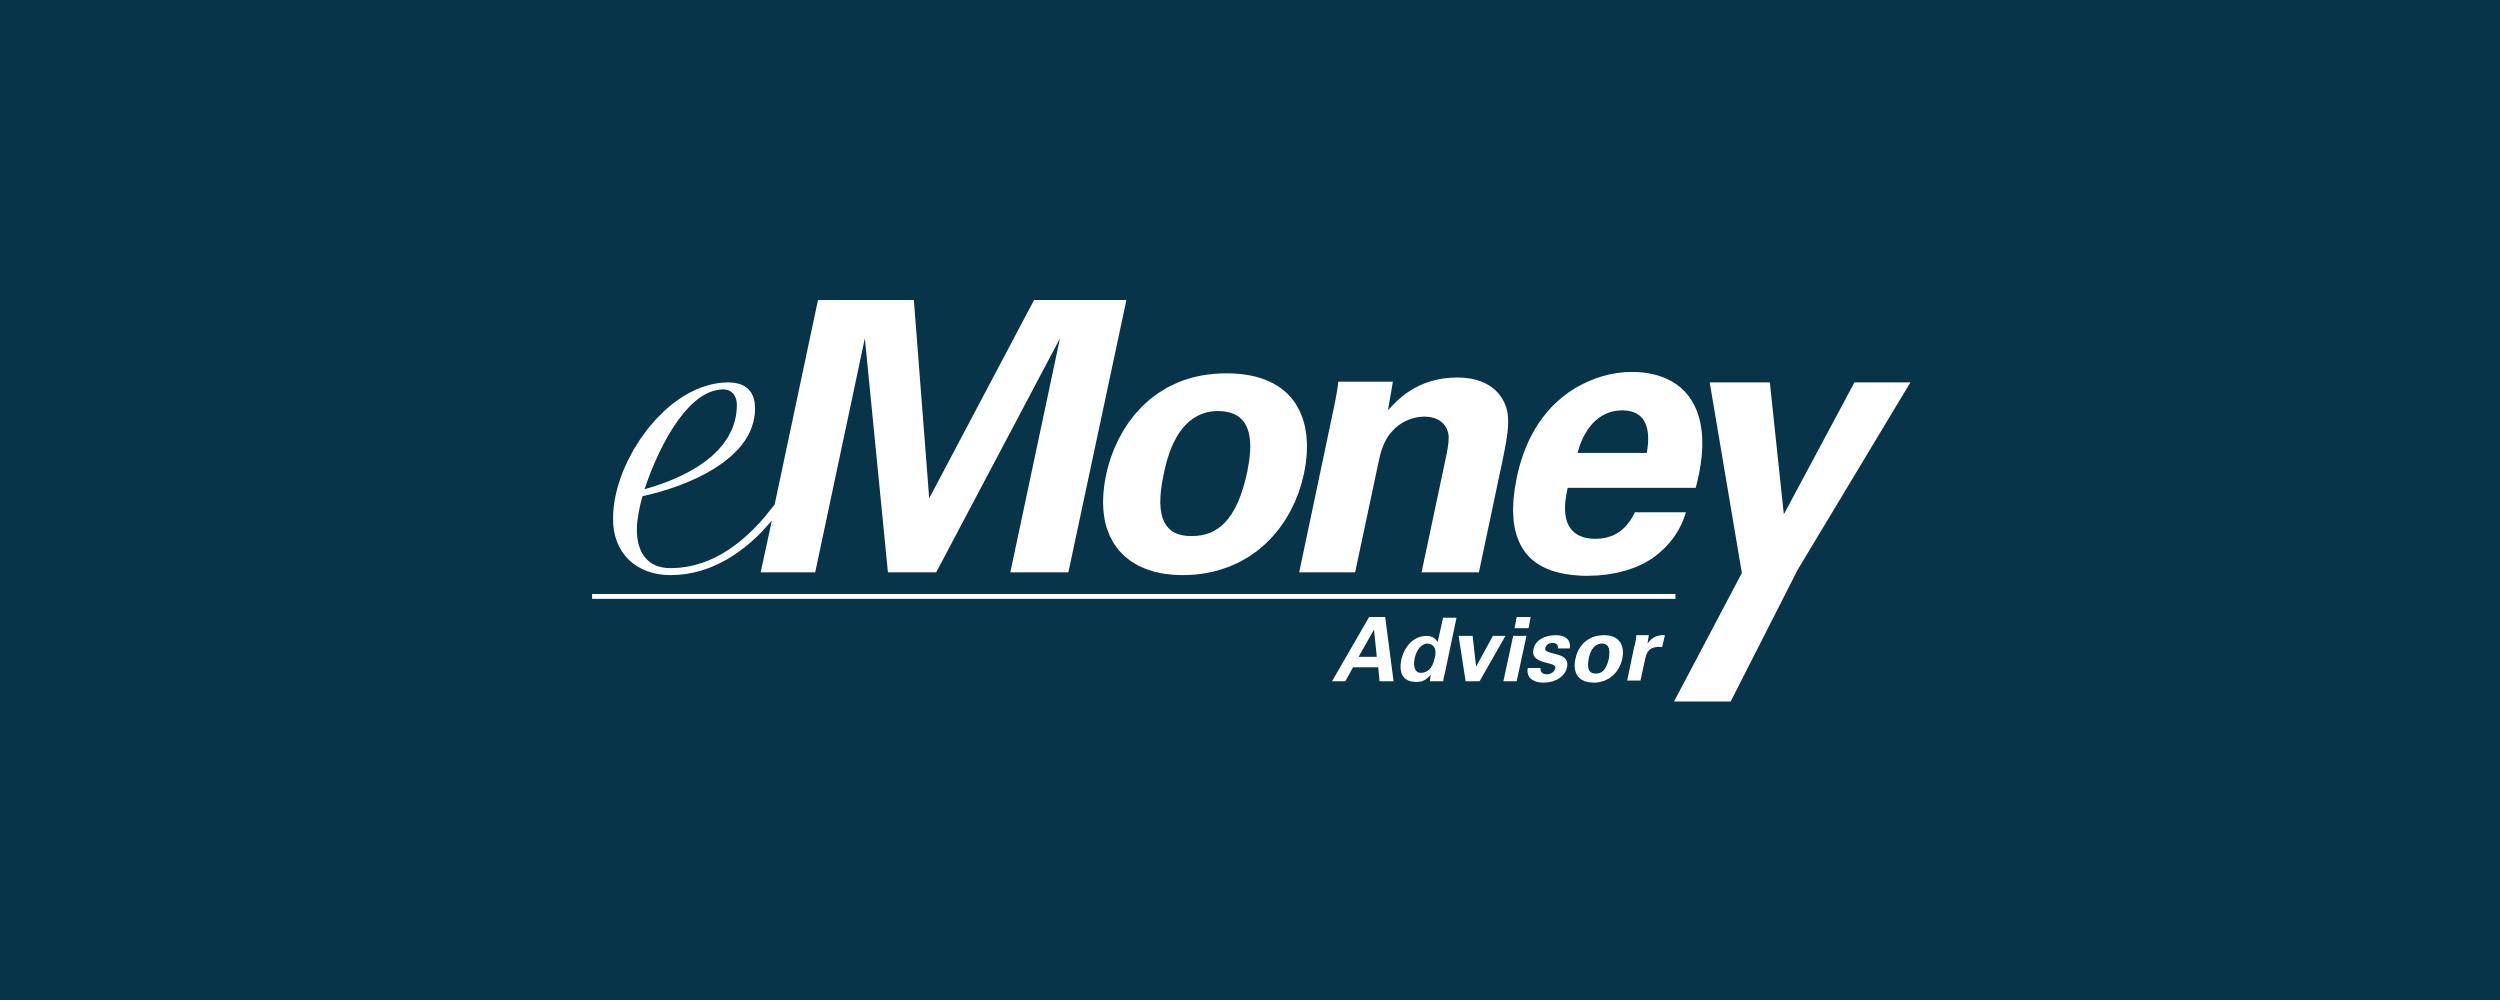 eMoney Advisor logo Columbus, OH TCP Asset Management